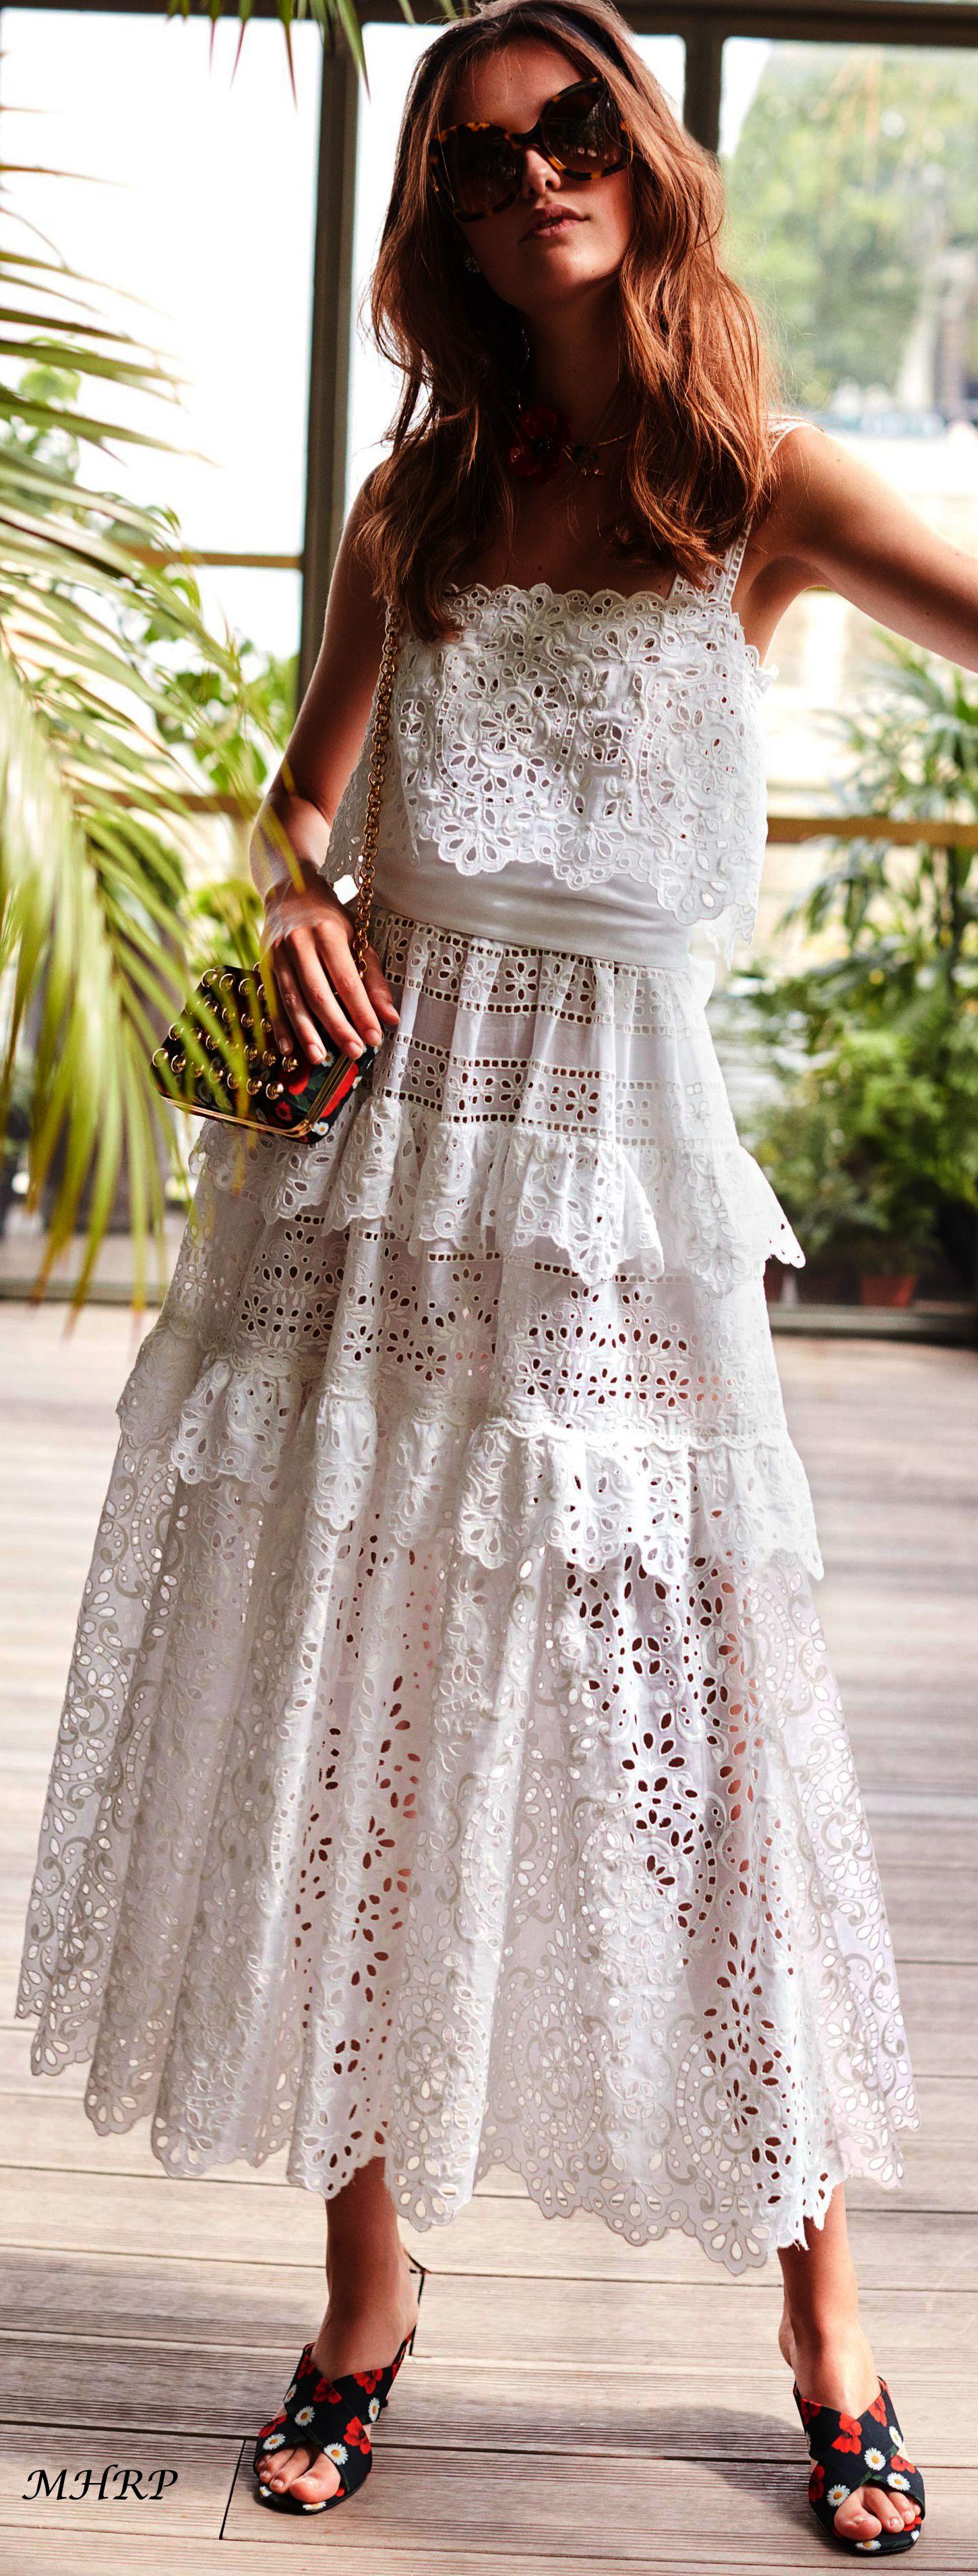 Elie Saab Vogue Resort 2019 Trendy Dresses Summer Fashion Summer Dresses [ 3822 x 1451 Pixel ]